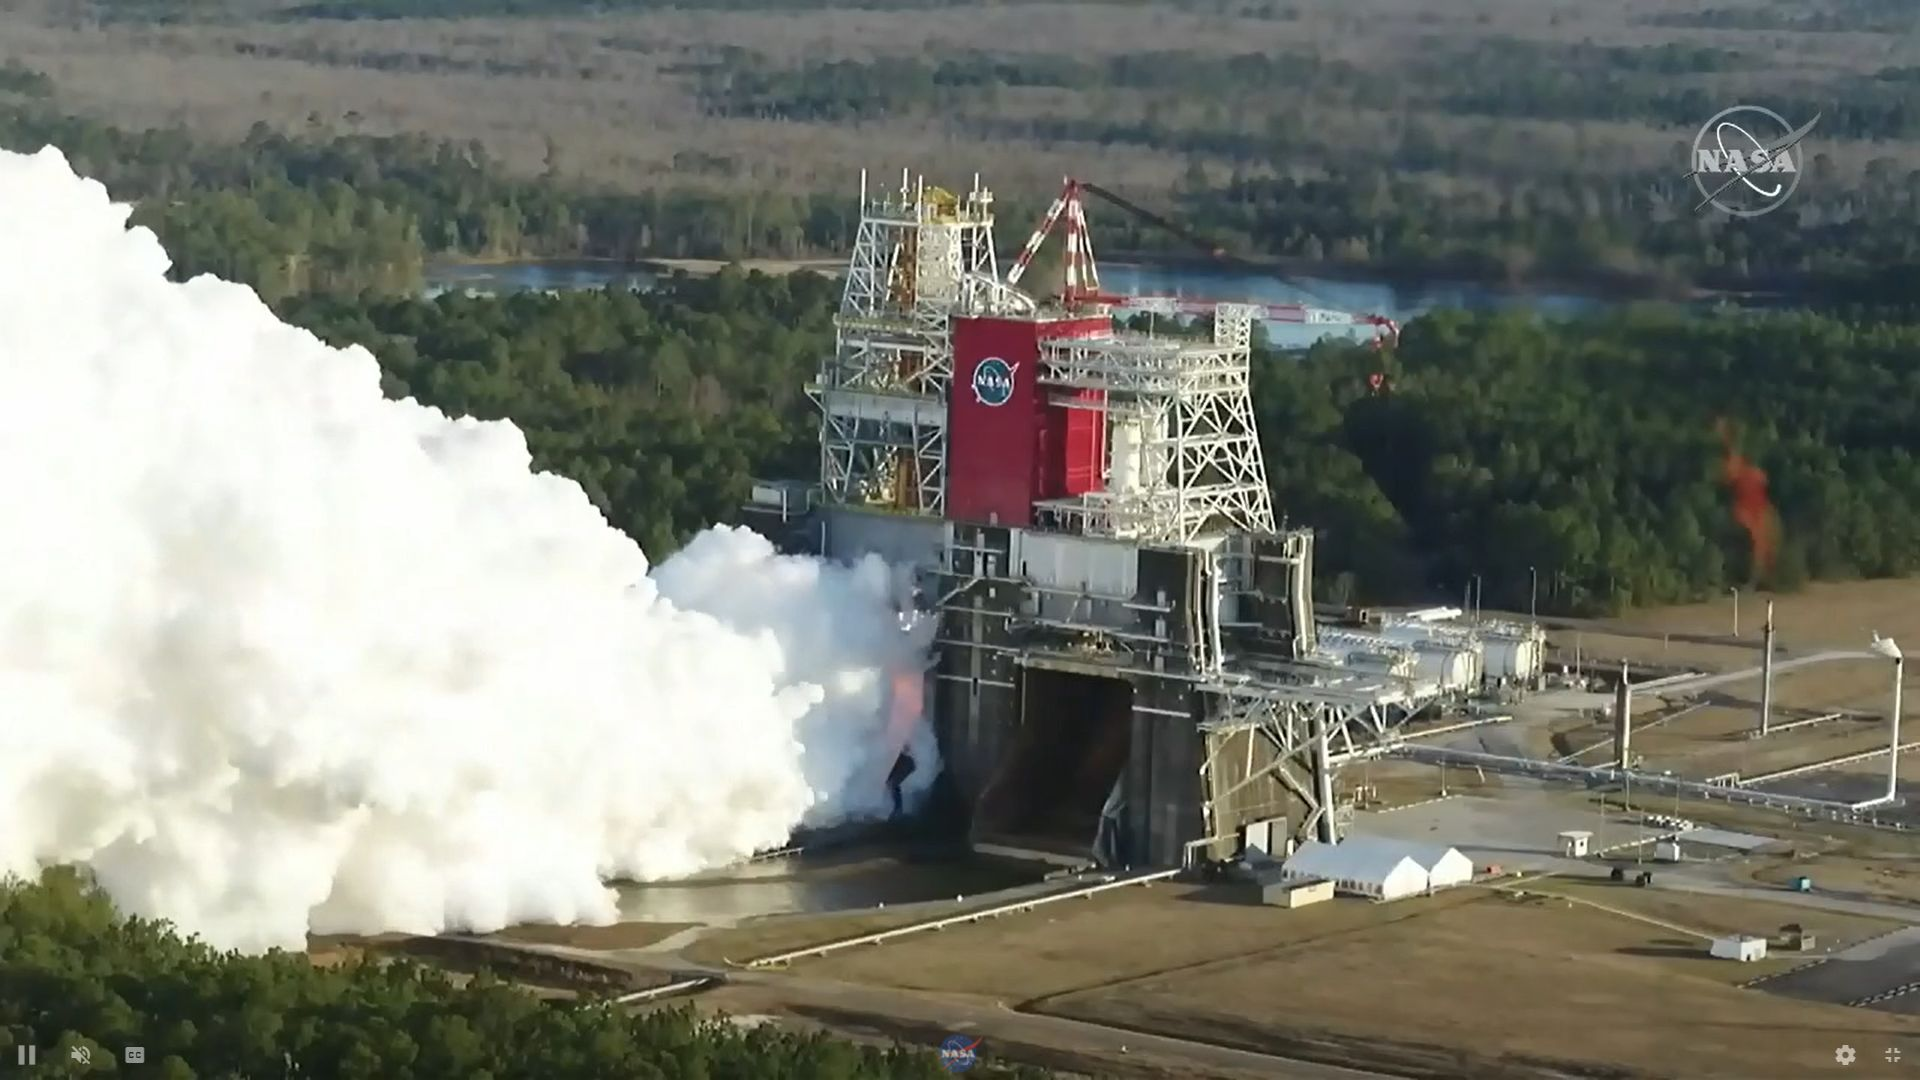 SLS test fire